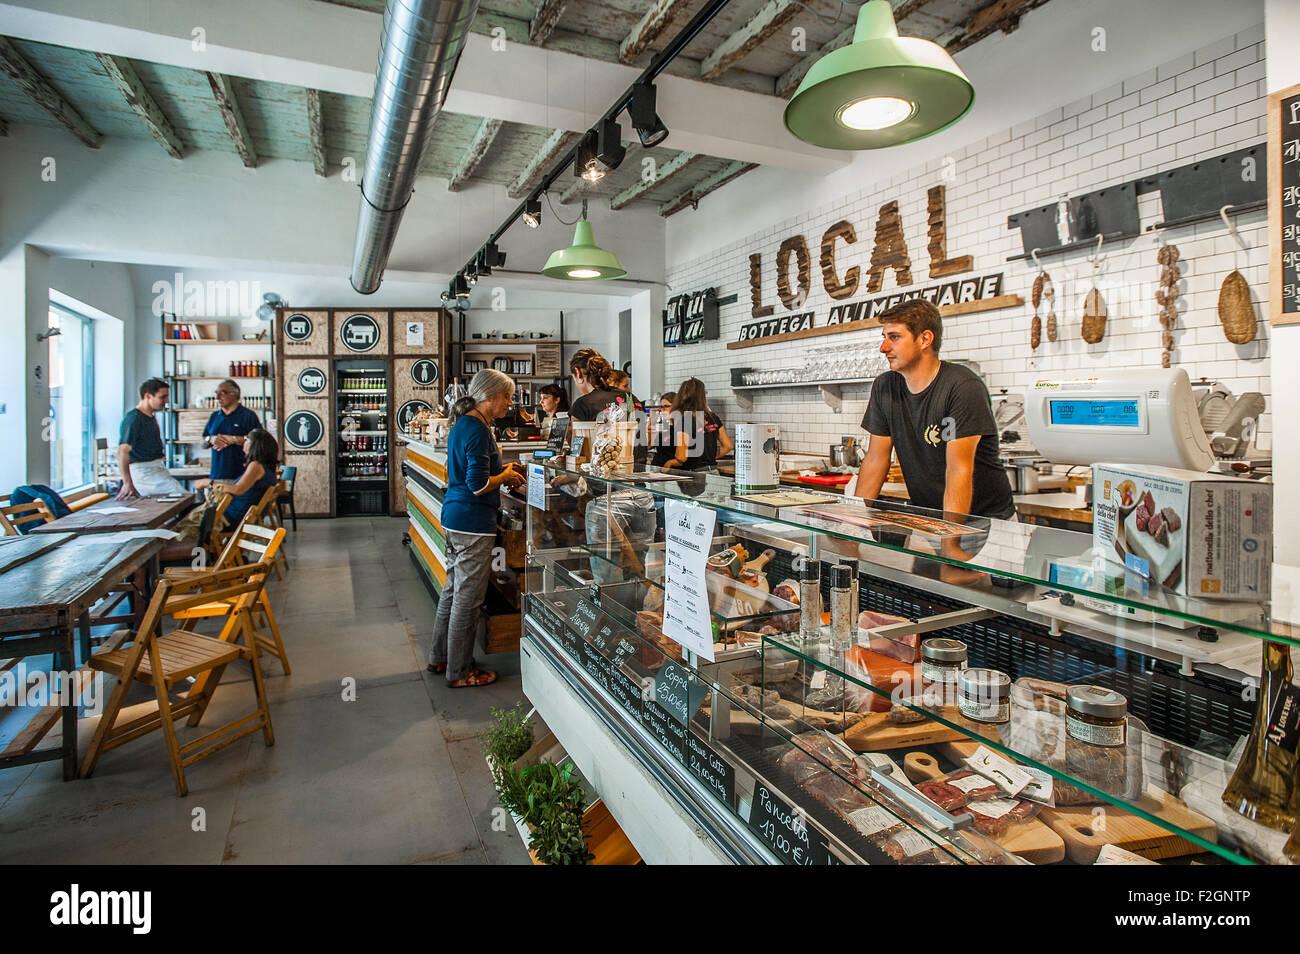 Italy Piedmont Bra 18th September 2015 - ' La bottega Alimentare ' - Stock Image